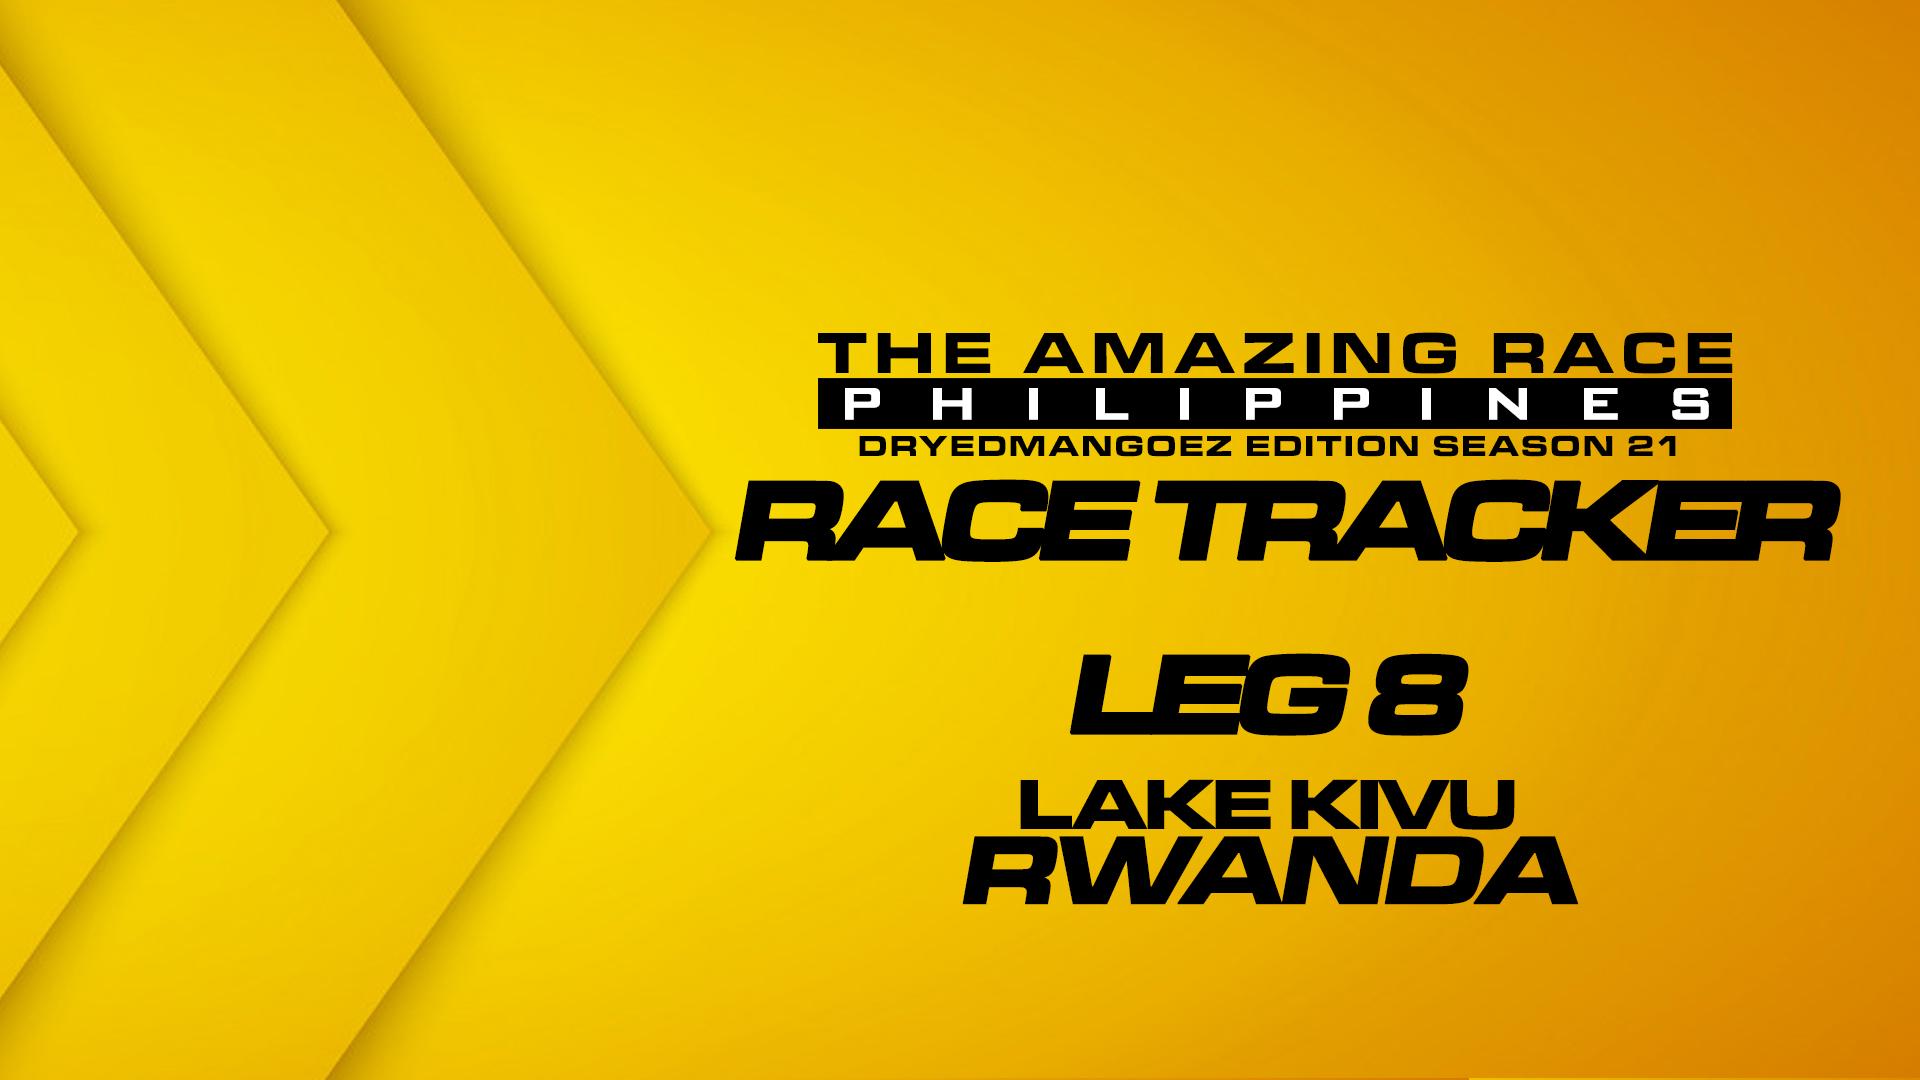 The Amazing Race Philippines: DryedMangoez Edition Season 21 Race Tracker – Leg 8